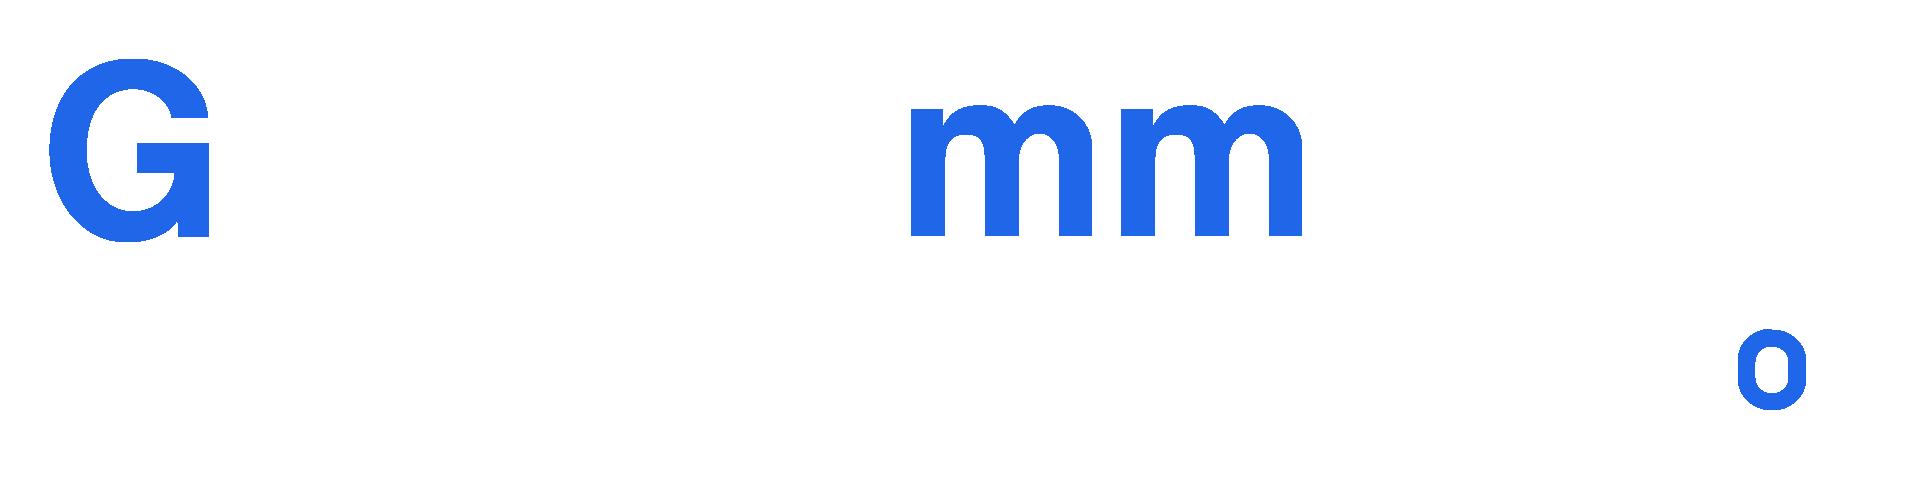 Gijs Hummelink Filmmontage